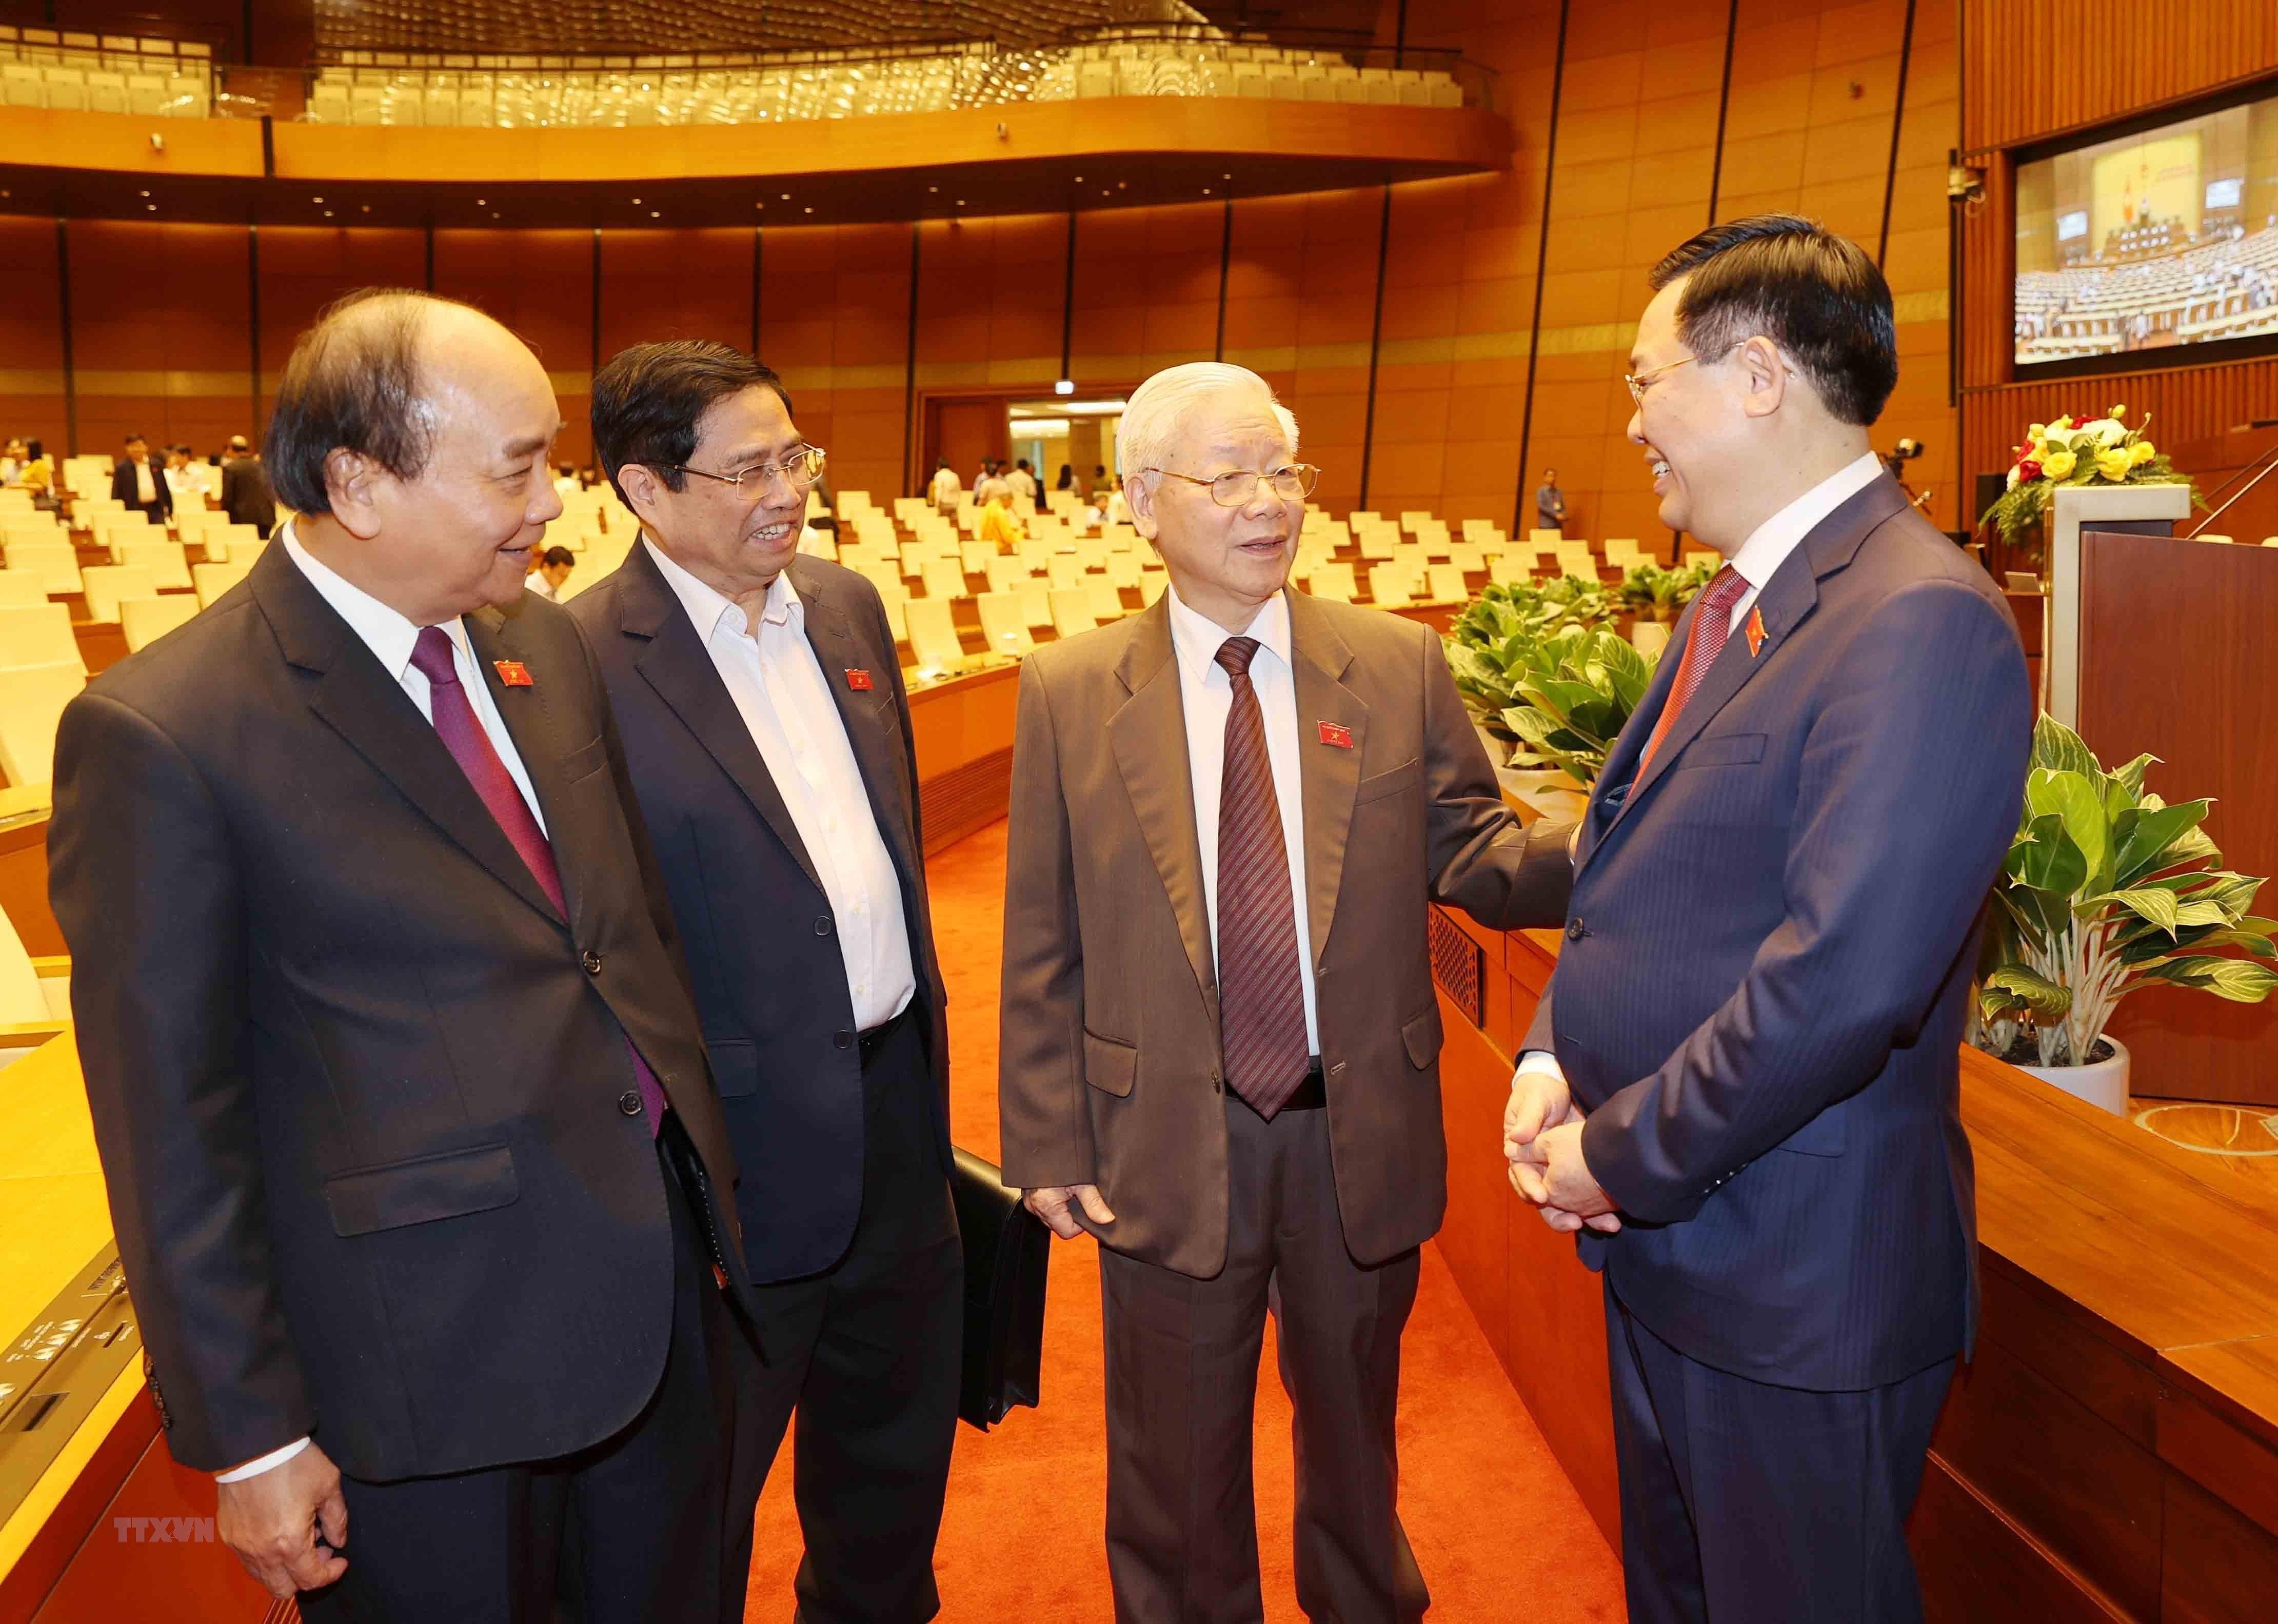 [Photo] Quoc hoi tien hanh quy trinh mien nhiem Chu tich nuoc hinh anh 4